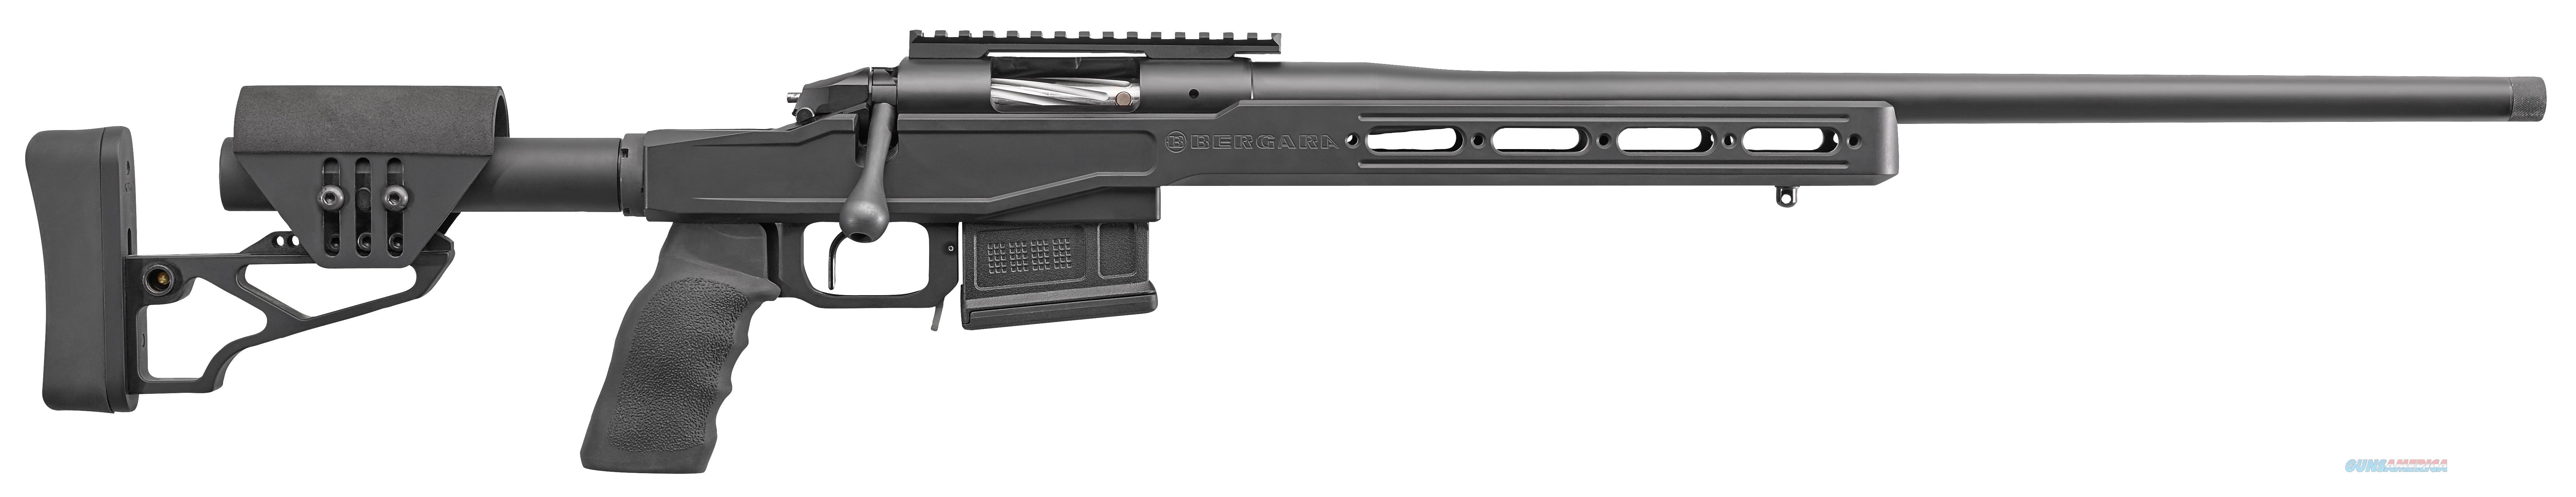 "Bergara Rifles Bpr17308c Bpr-17 Premier Lrp Bolt 308 Winchester/7.62 Nato 20"" Tb 5+1 Synthetic Adjustable/Aluminum Chassis Black Stk Black Nitride/Black Cerakote BPR17308C  Guns > Rifles > B Misc Rifles"